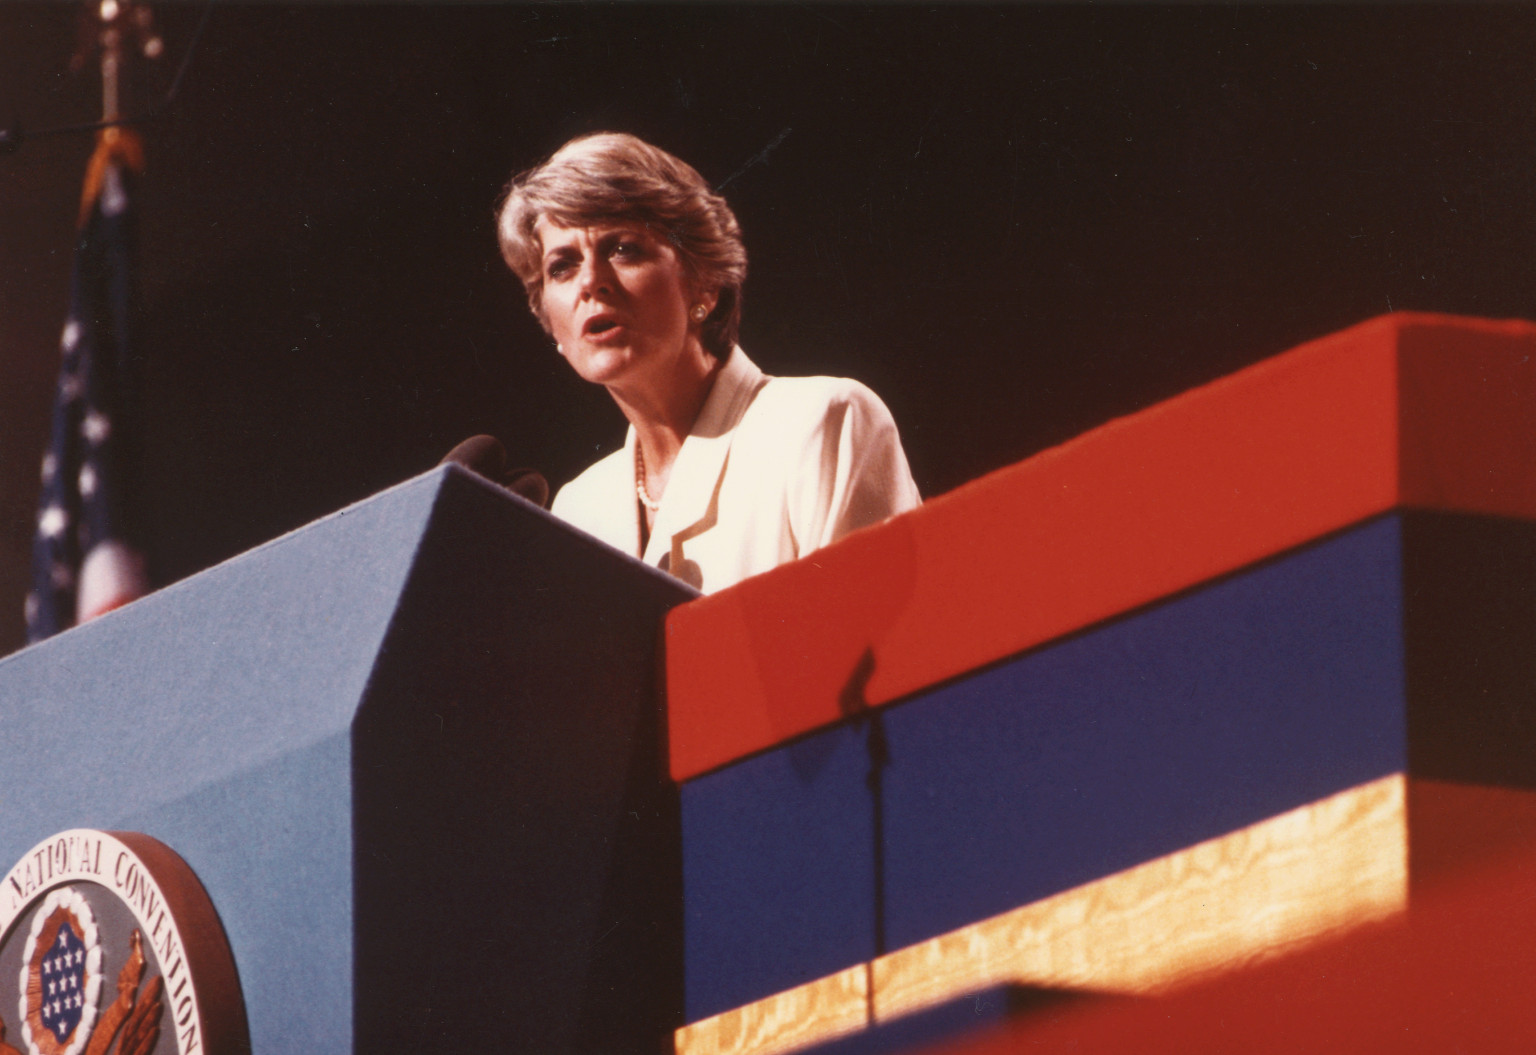 geraldine ferraro Geraldine anne gerry ferraro (august 26, 1935 – march 26, 2011) was an  american attorney and democratic party politician who served in the united  states.